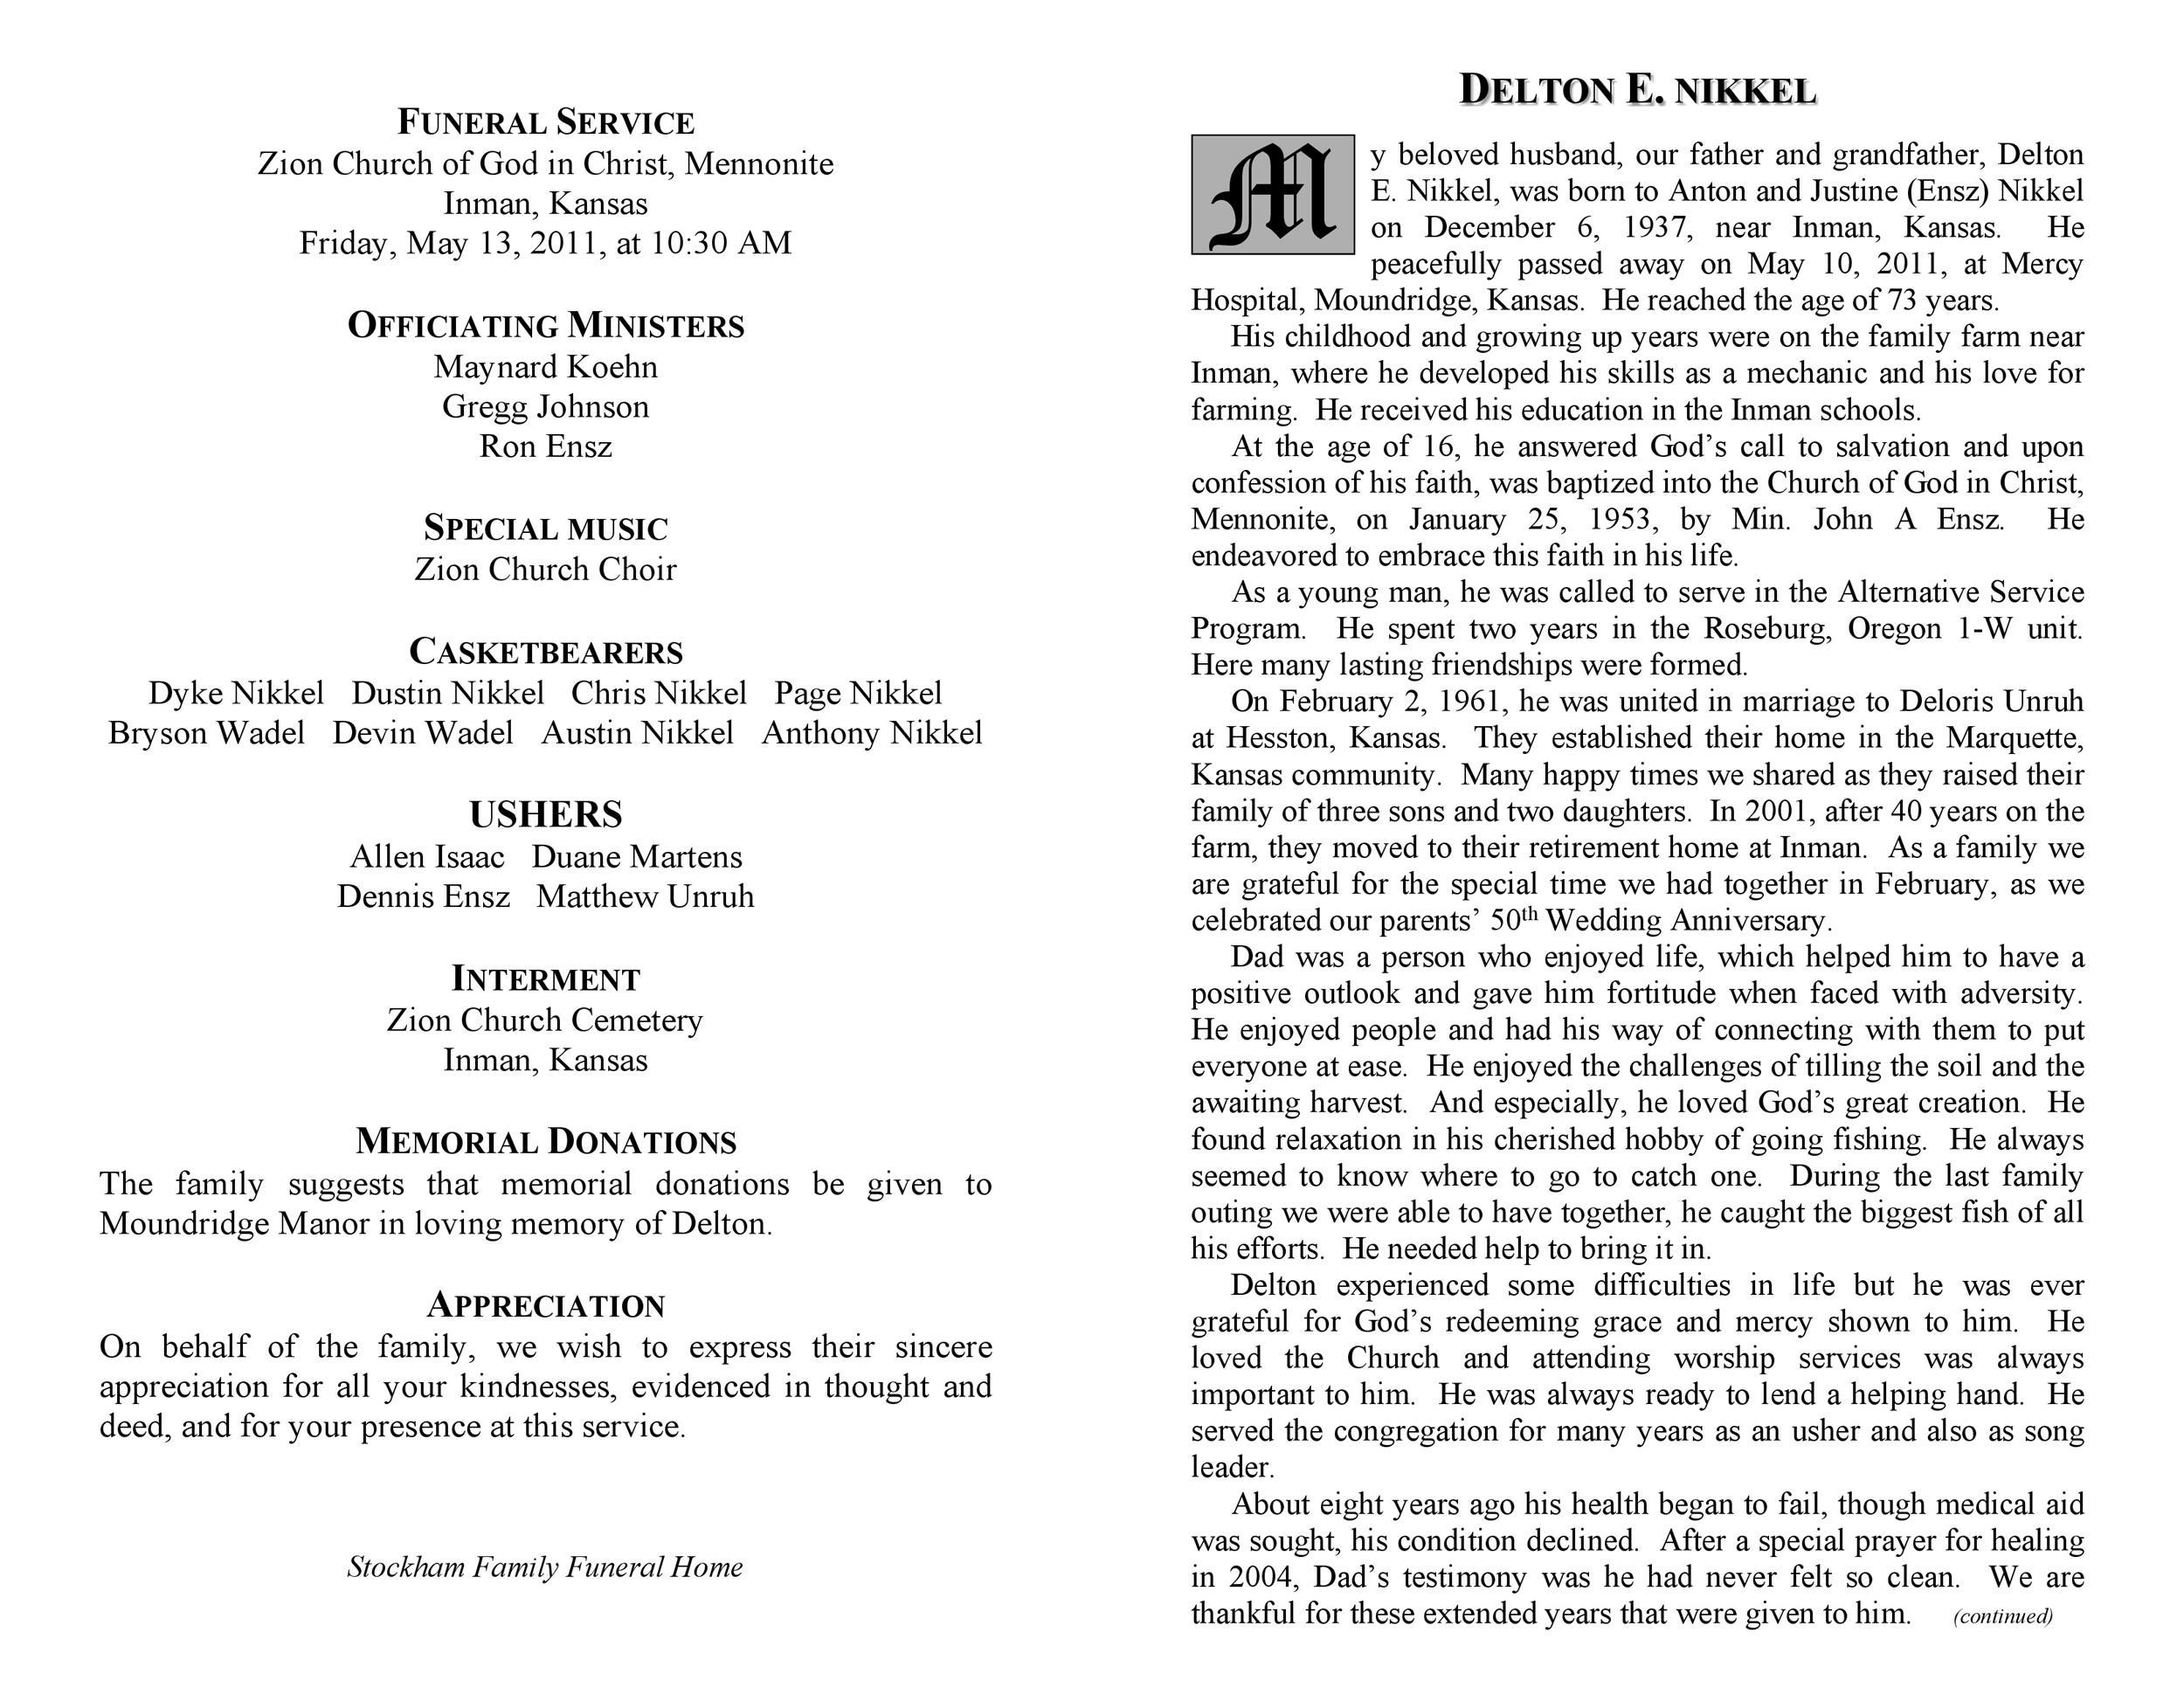 Free funeral program template 25